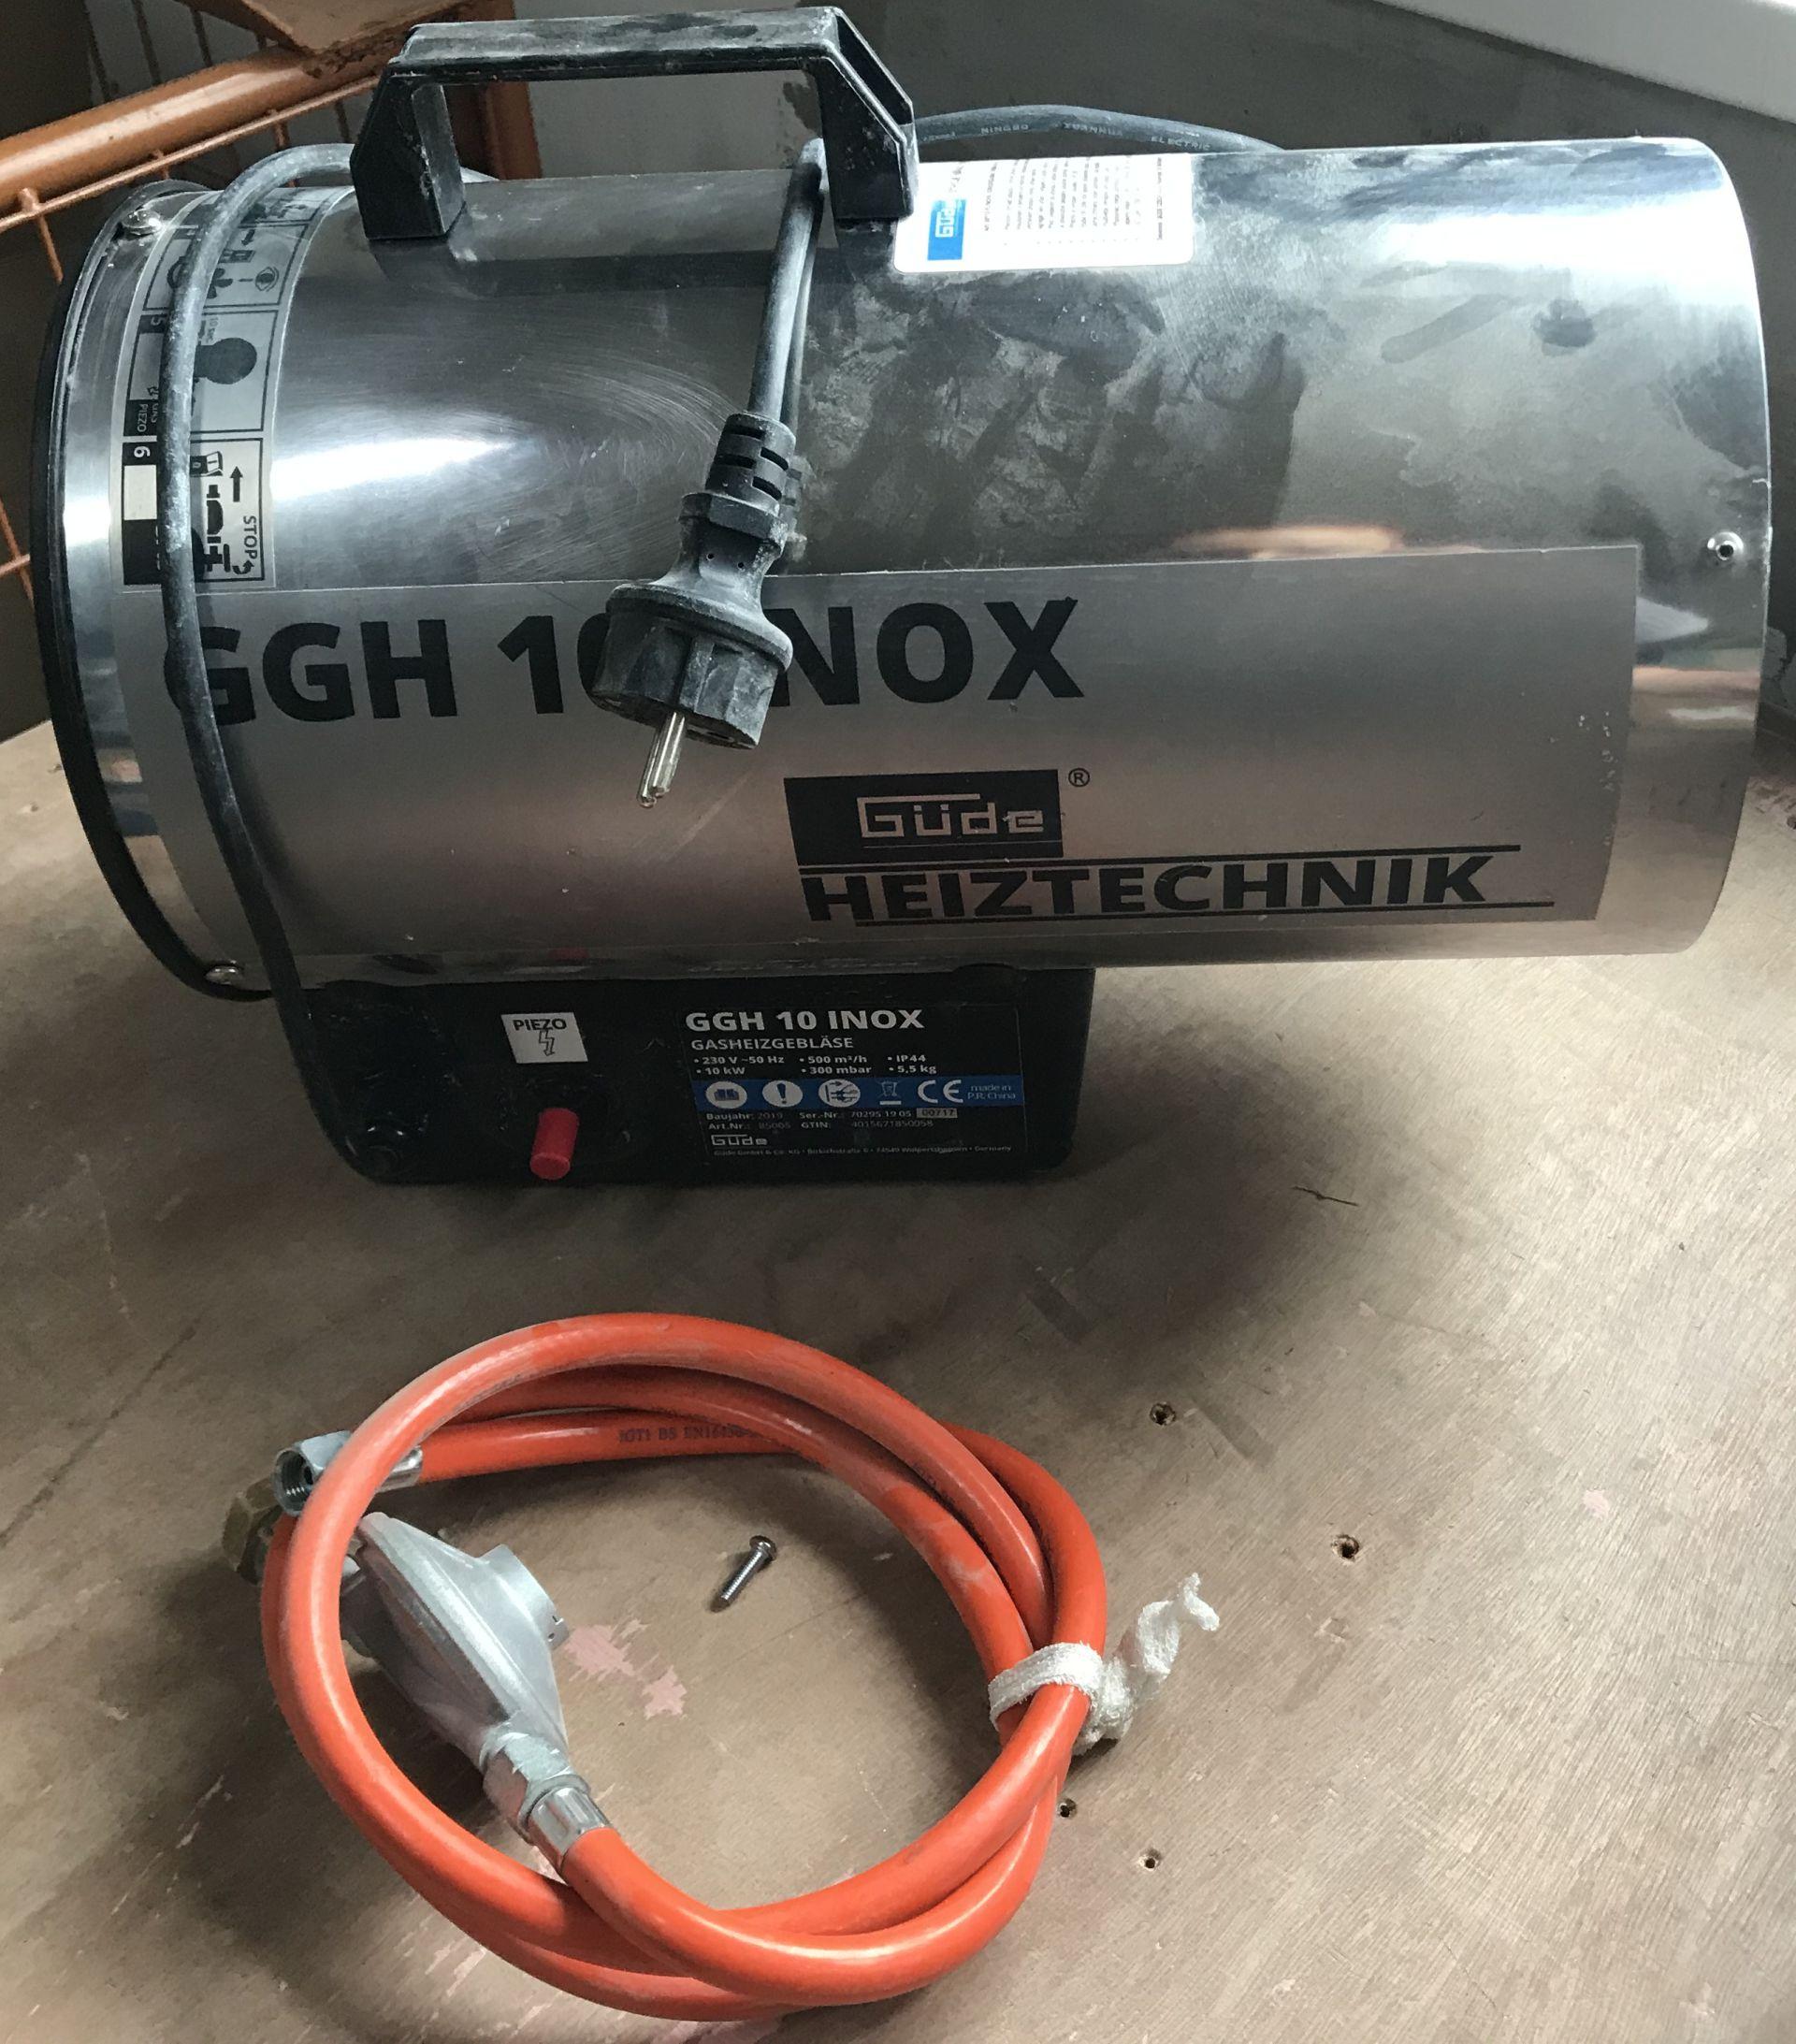 VÝPRODEJ GÜDE GGH 10 INOX Horkovzdušná plynová turbína 85005, PO SERVISE, POUŽITÉ!!!